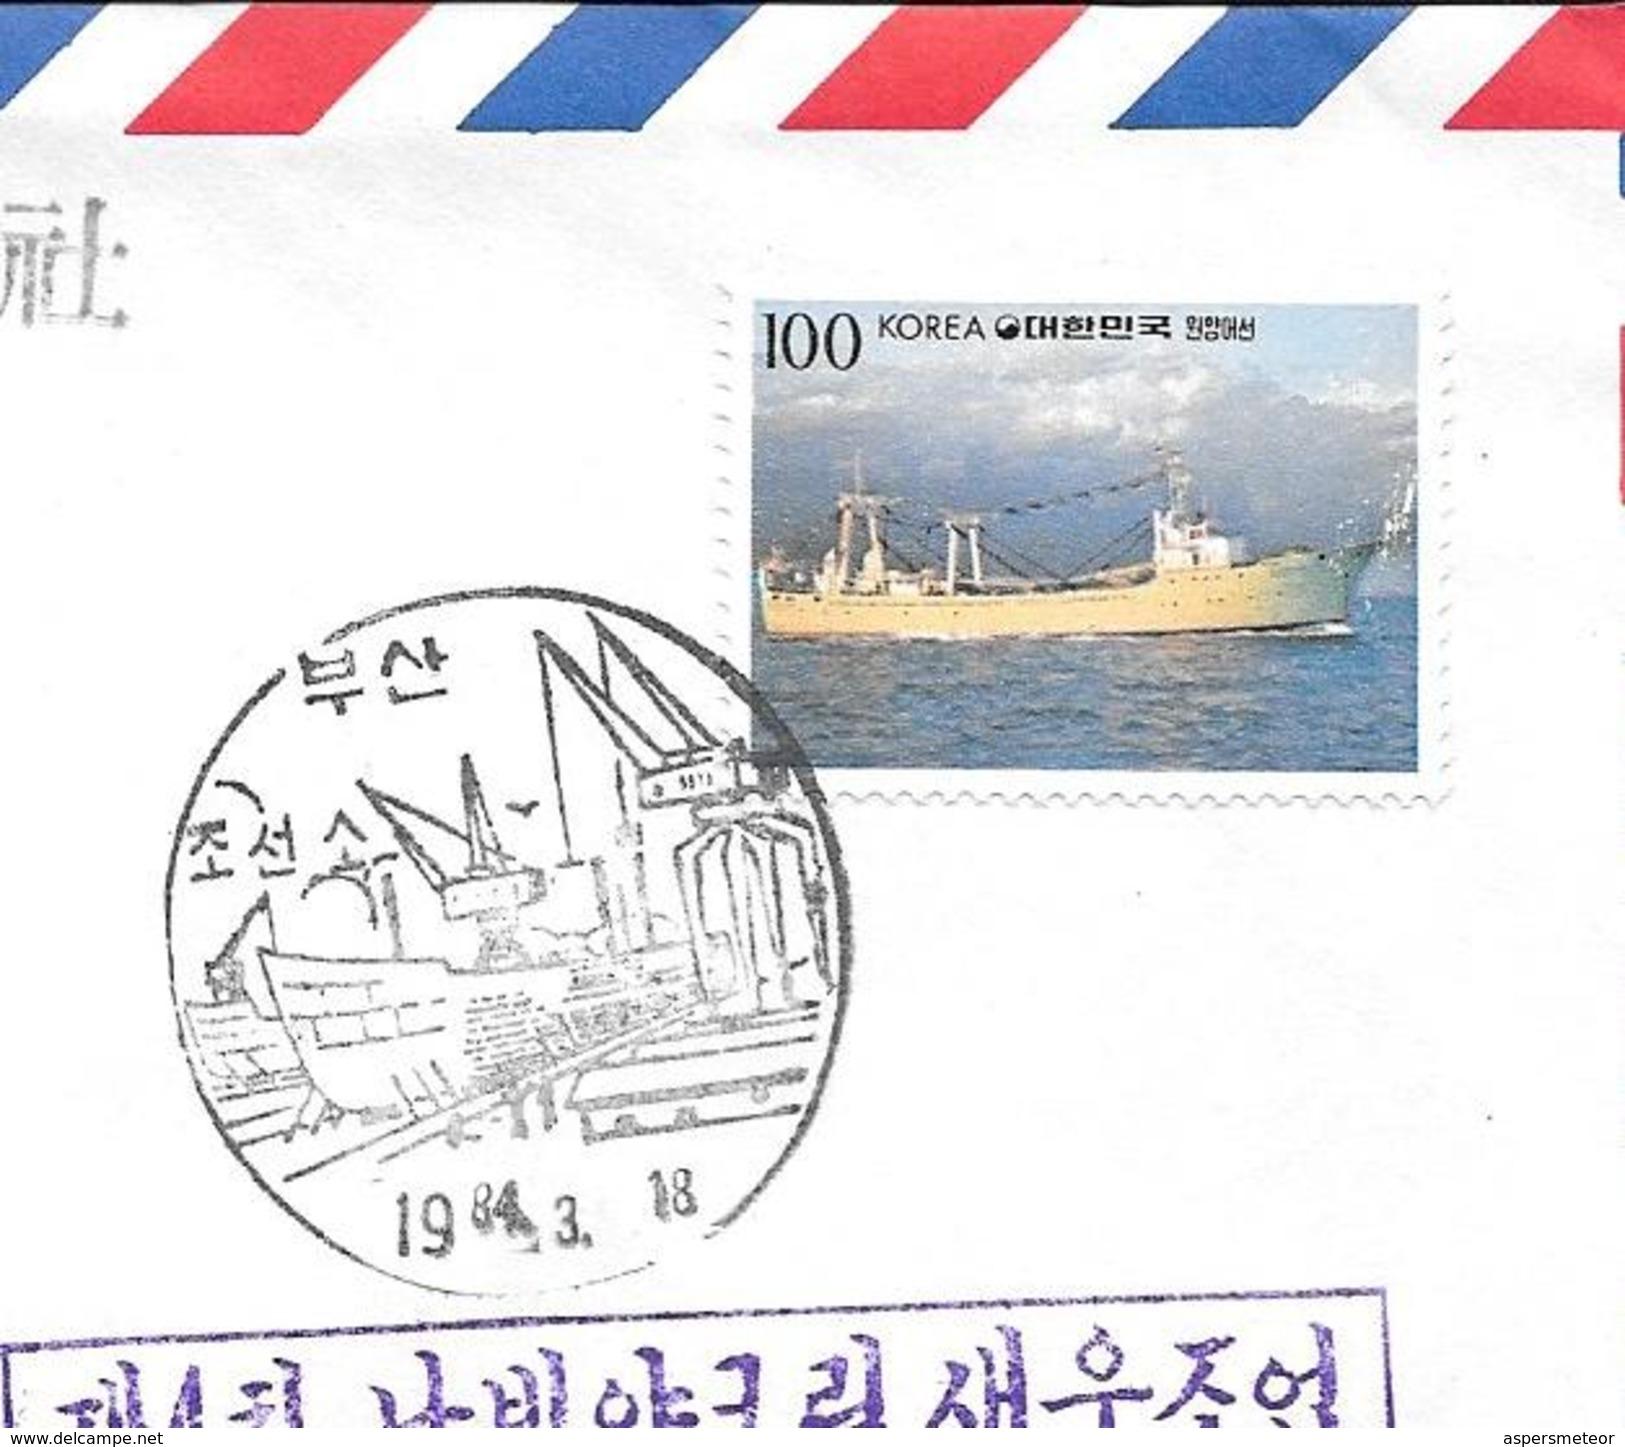 JAPANESE ICE BREAKER SHIRASE AND POLAR EXPEDITIONS COLLECTION VOZNESENSKI 30 ITEMS UNIQUE EN DELCAMPE MAGNIFIQUE - Polar Ships & Icebreakers